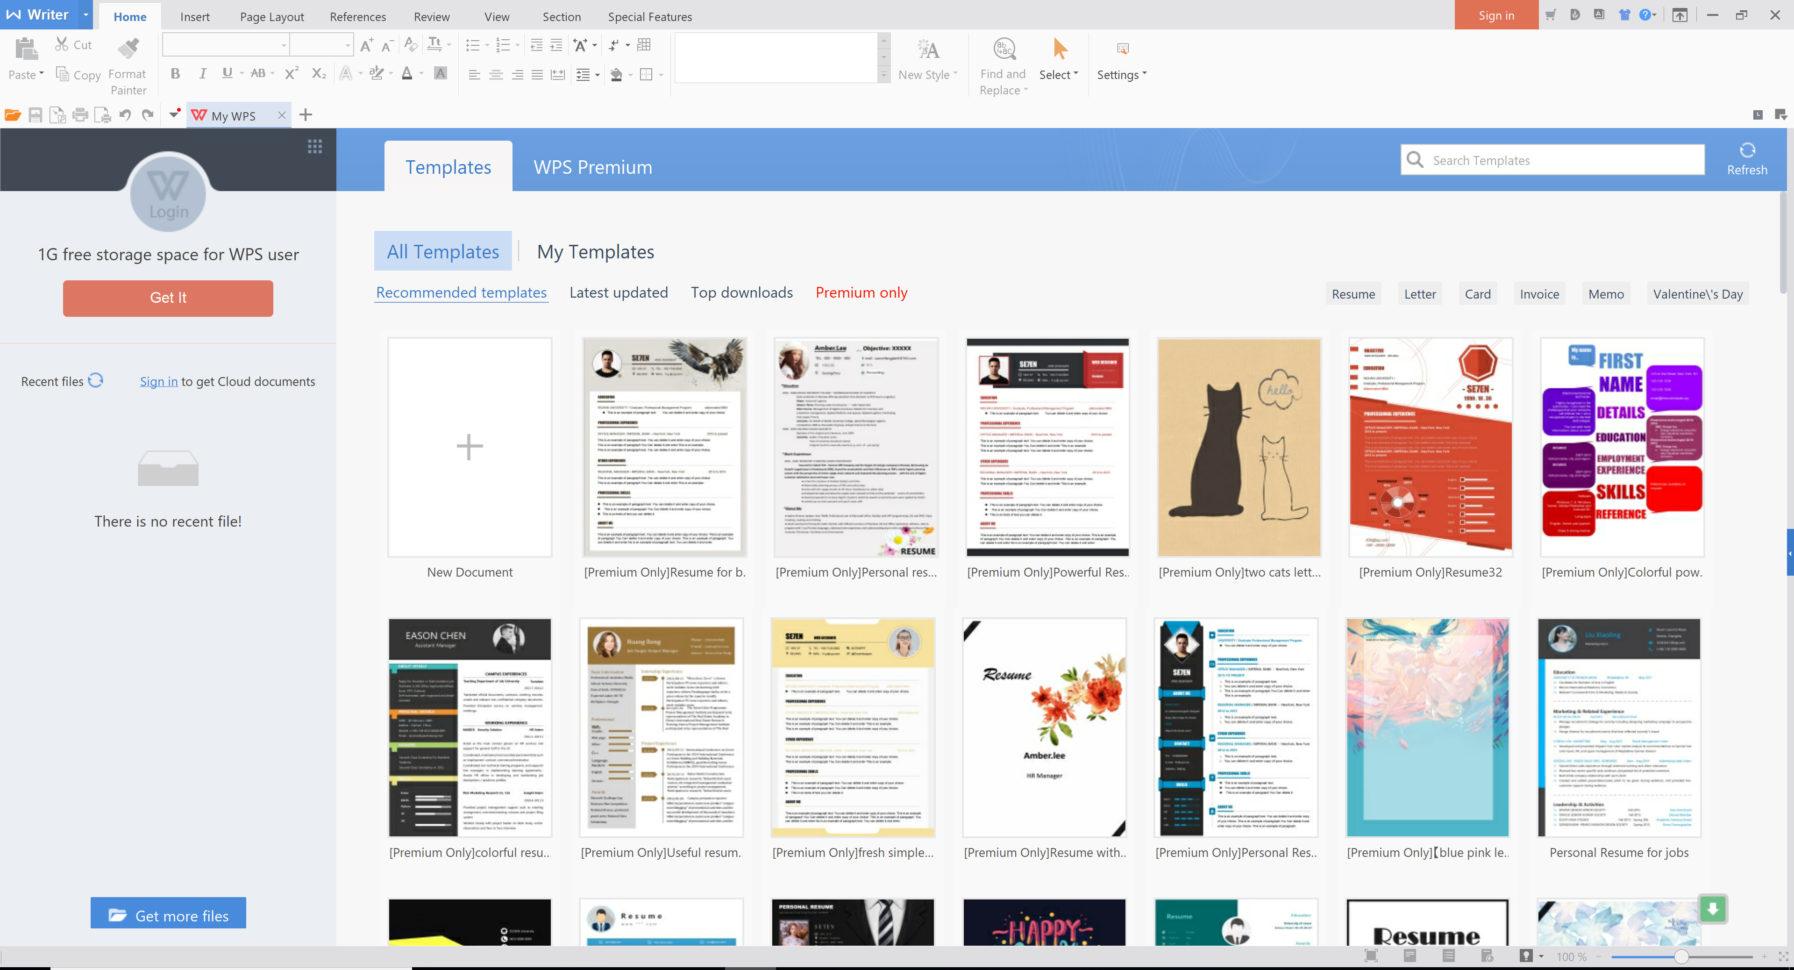 Bre 365 Spreadsheet Within Wps Spreadsheet Best Of Migliore Alternativa A Fice 365 Wizblog – My